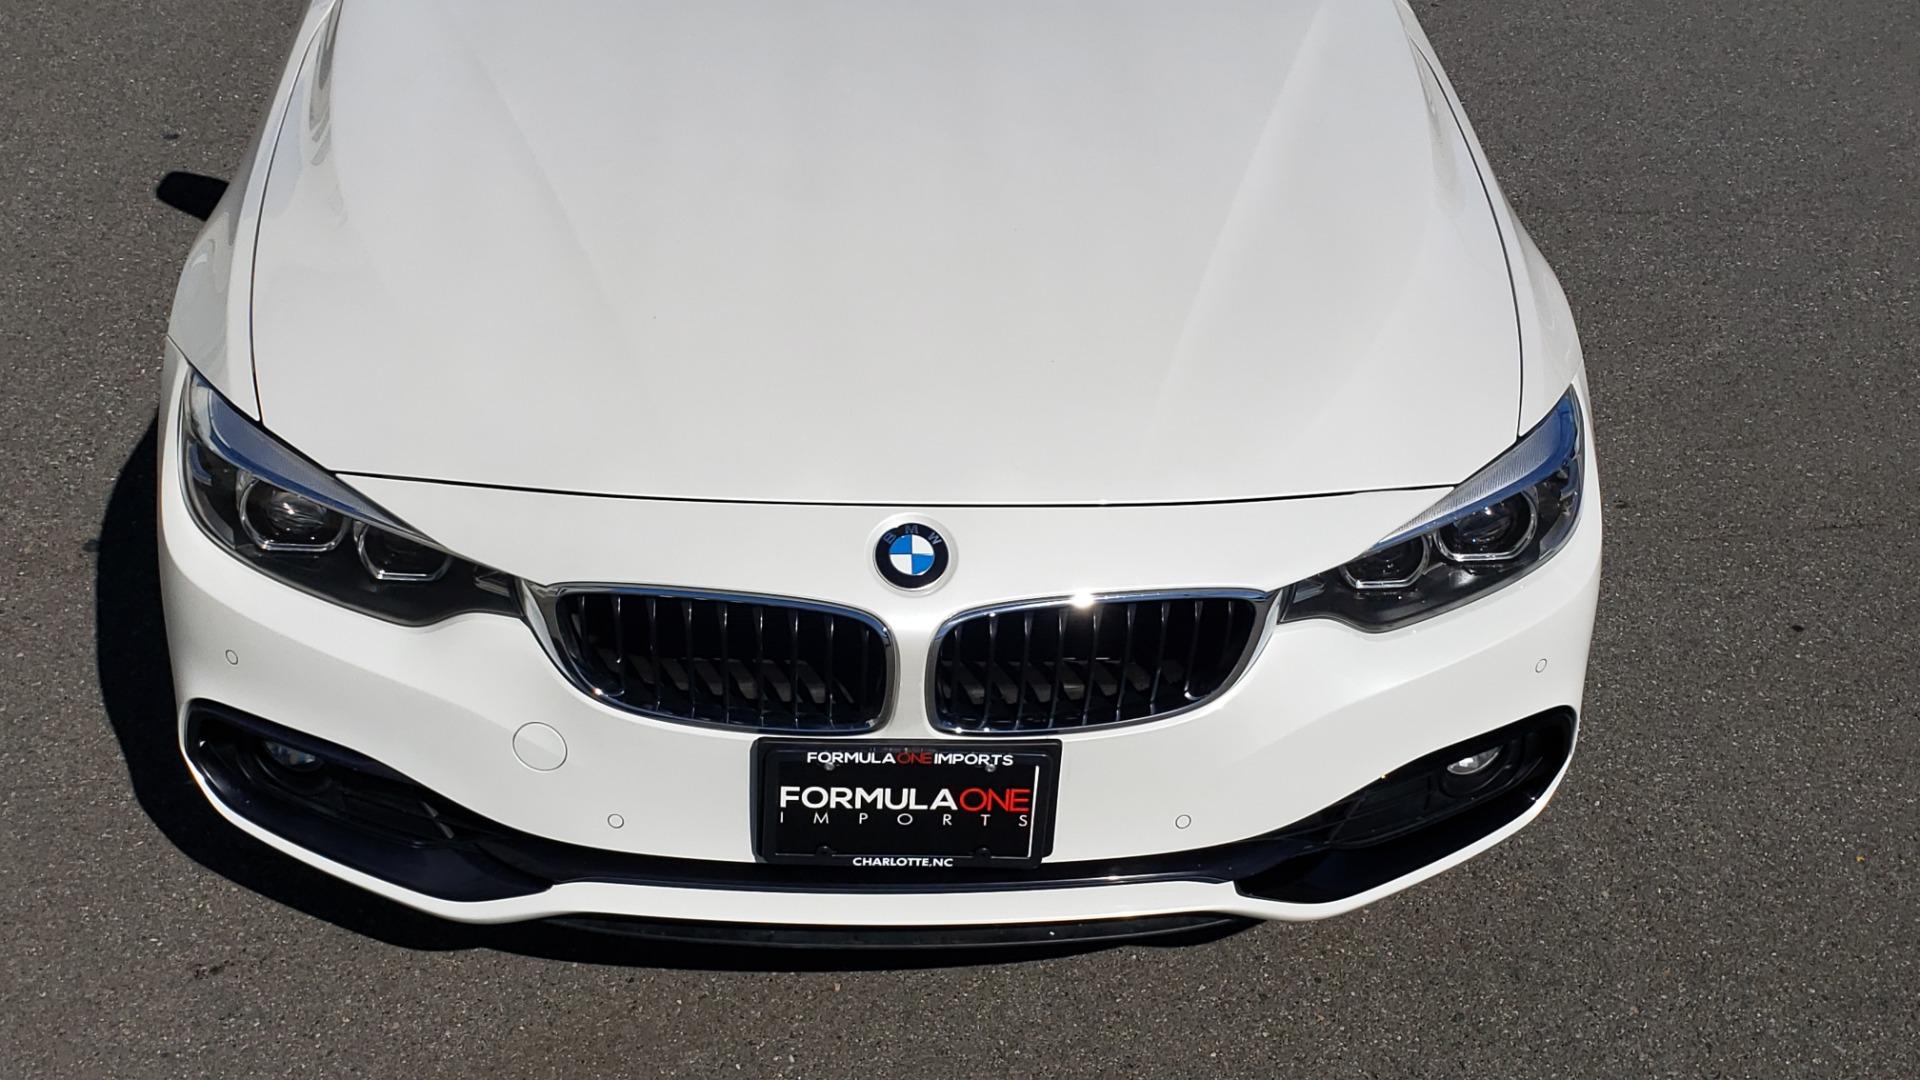 Used 2018 BMW 4 SERIES 430IXDRIVE / PREMIUM / NAV / SUNROOF / ESSENTIALS PKG for sale $28,995 at Formula Imports in Charlotte NC 28227 27